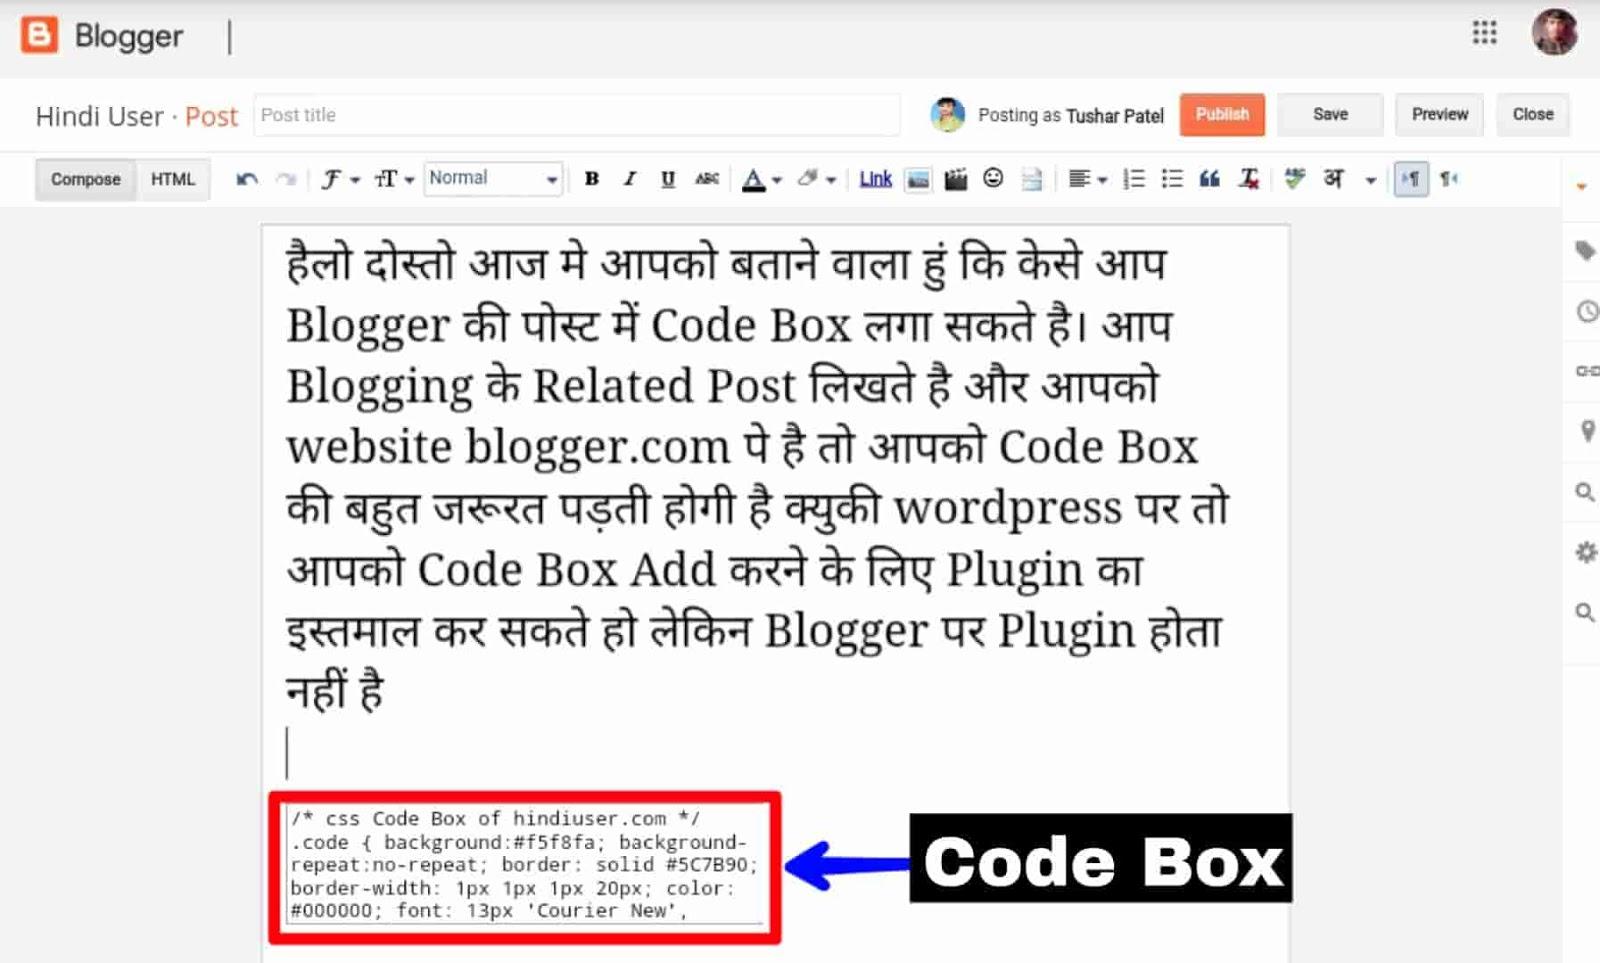 blogger post me code box kaise lagaye